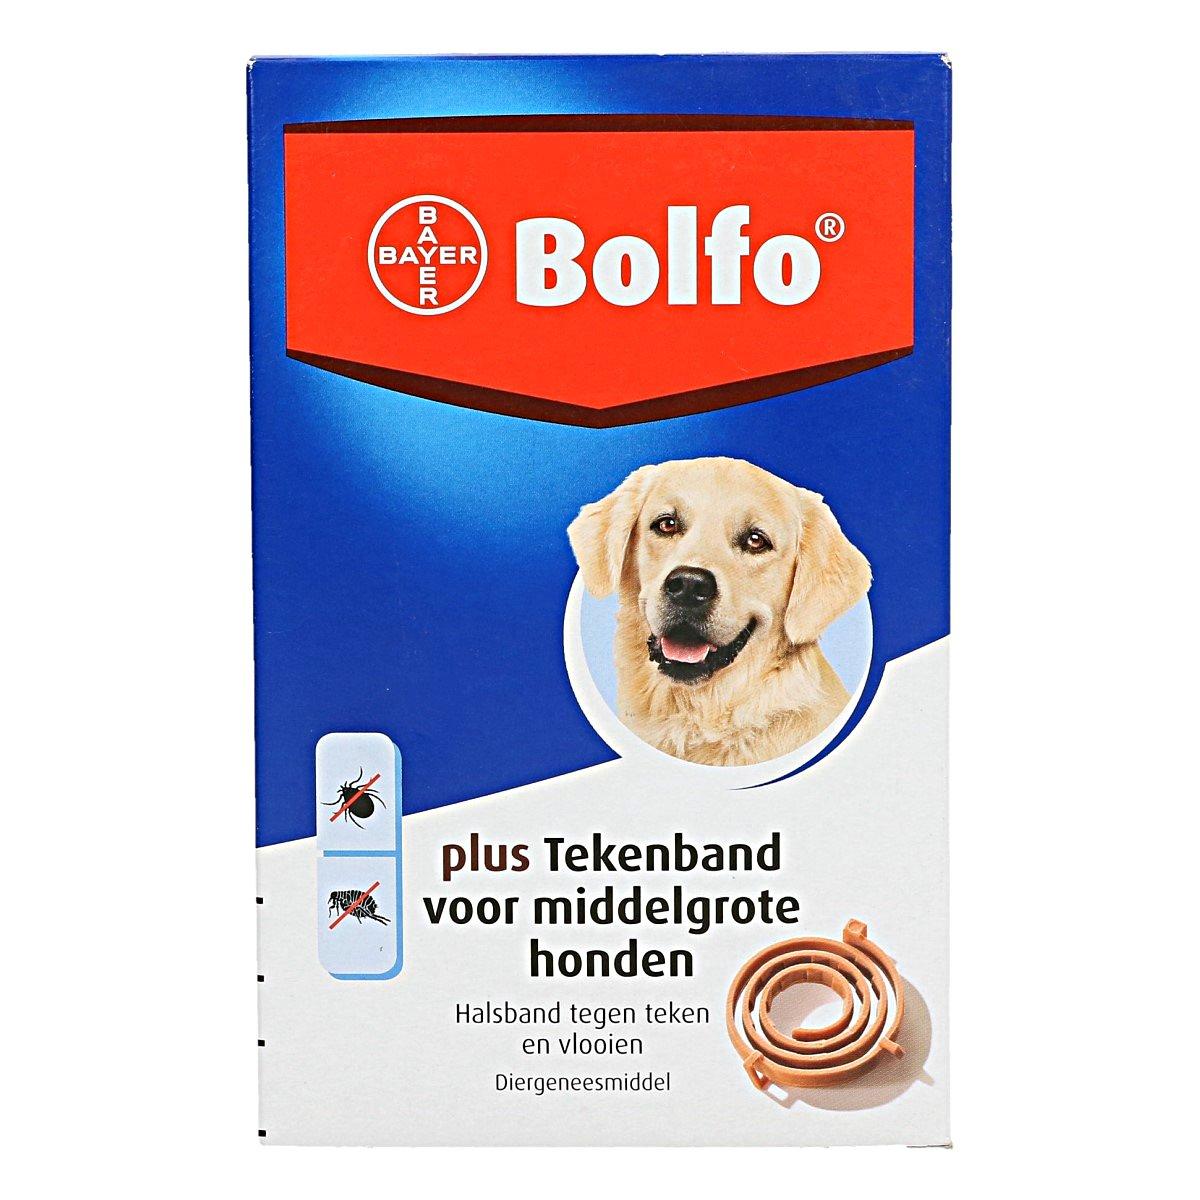 Afbeelding van Advantage H bolfo tekenband middelgrote hond 1 stuk